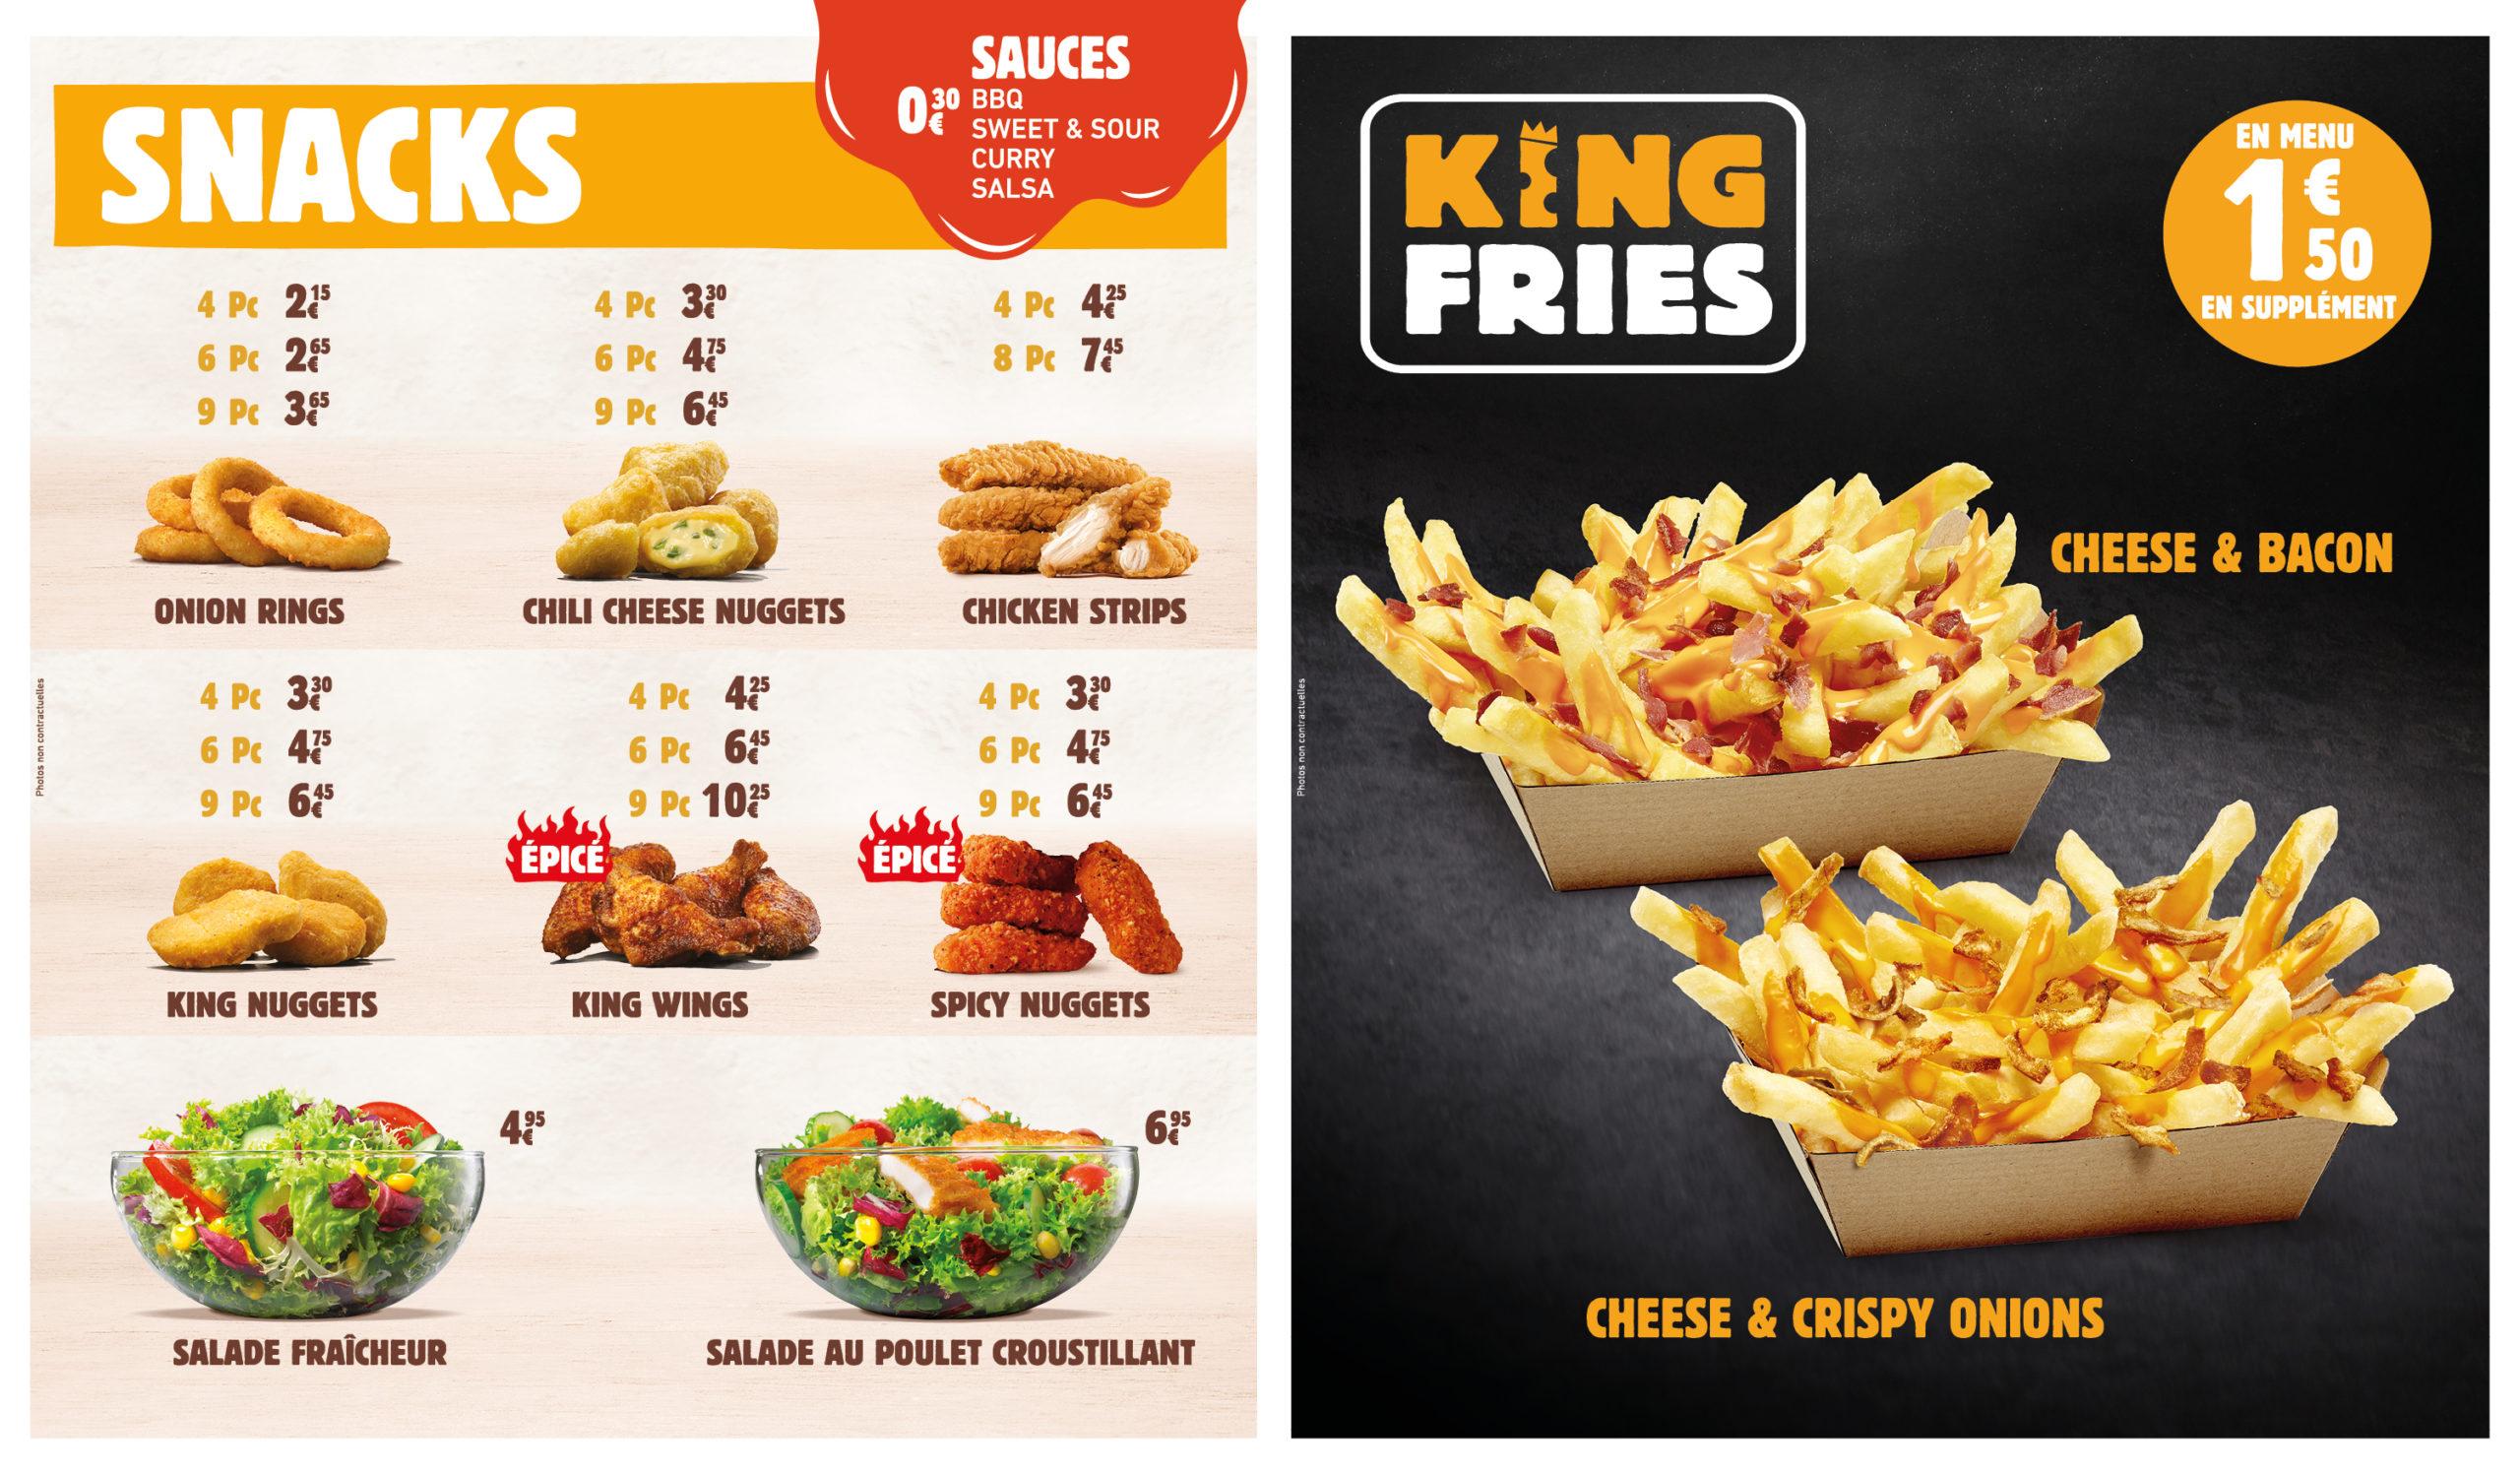 Ecran Snack-King Fries-St Louis-106x62cm-05-2021